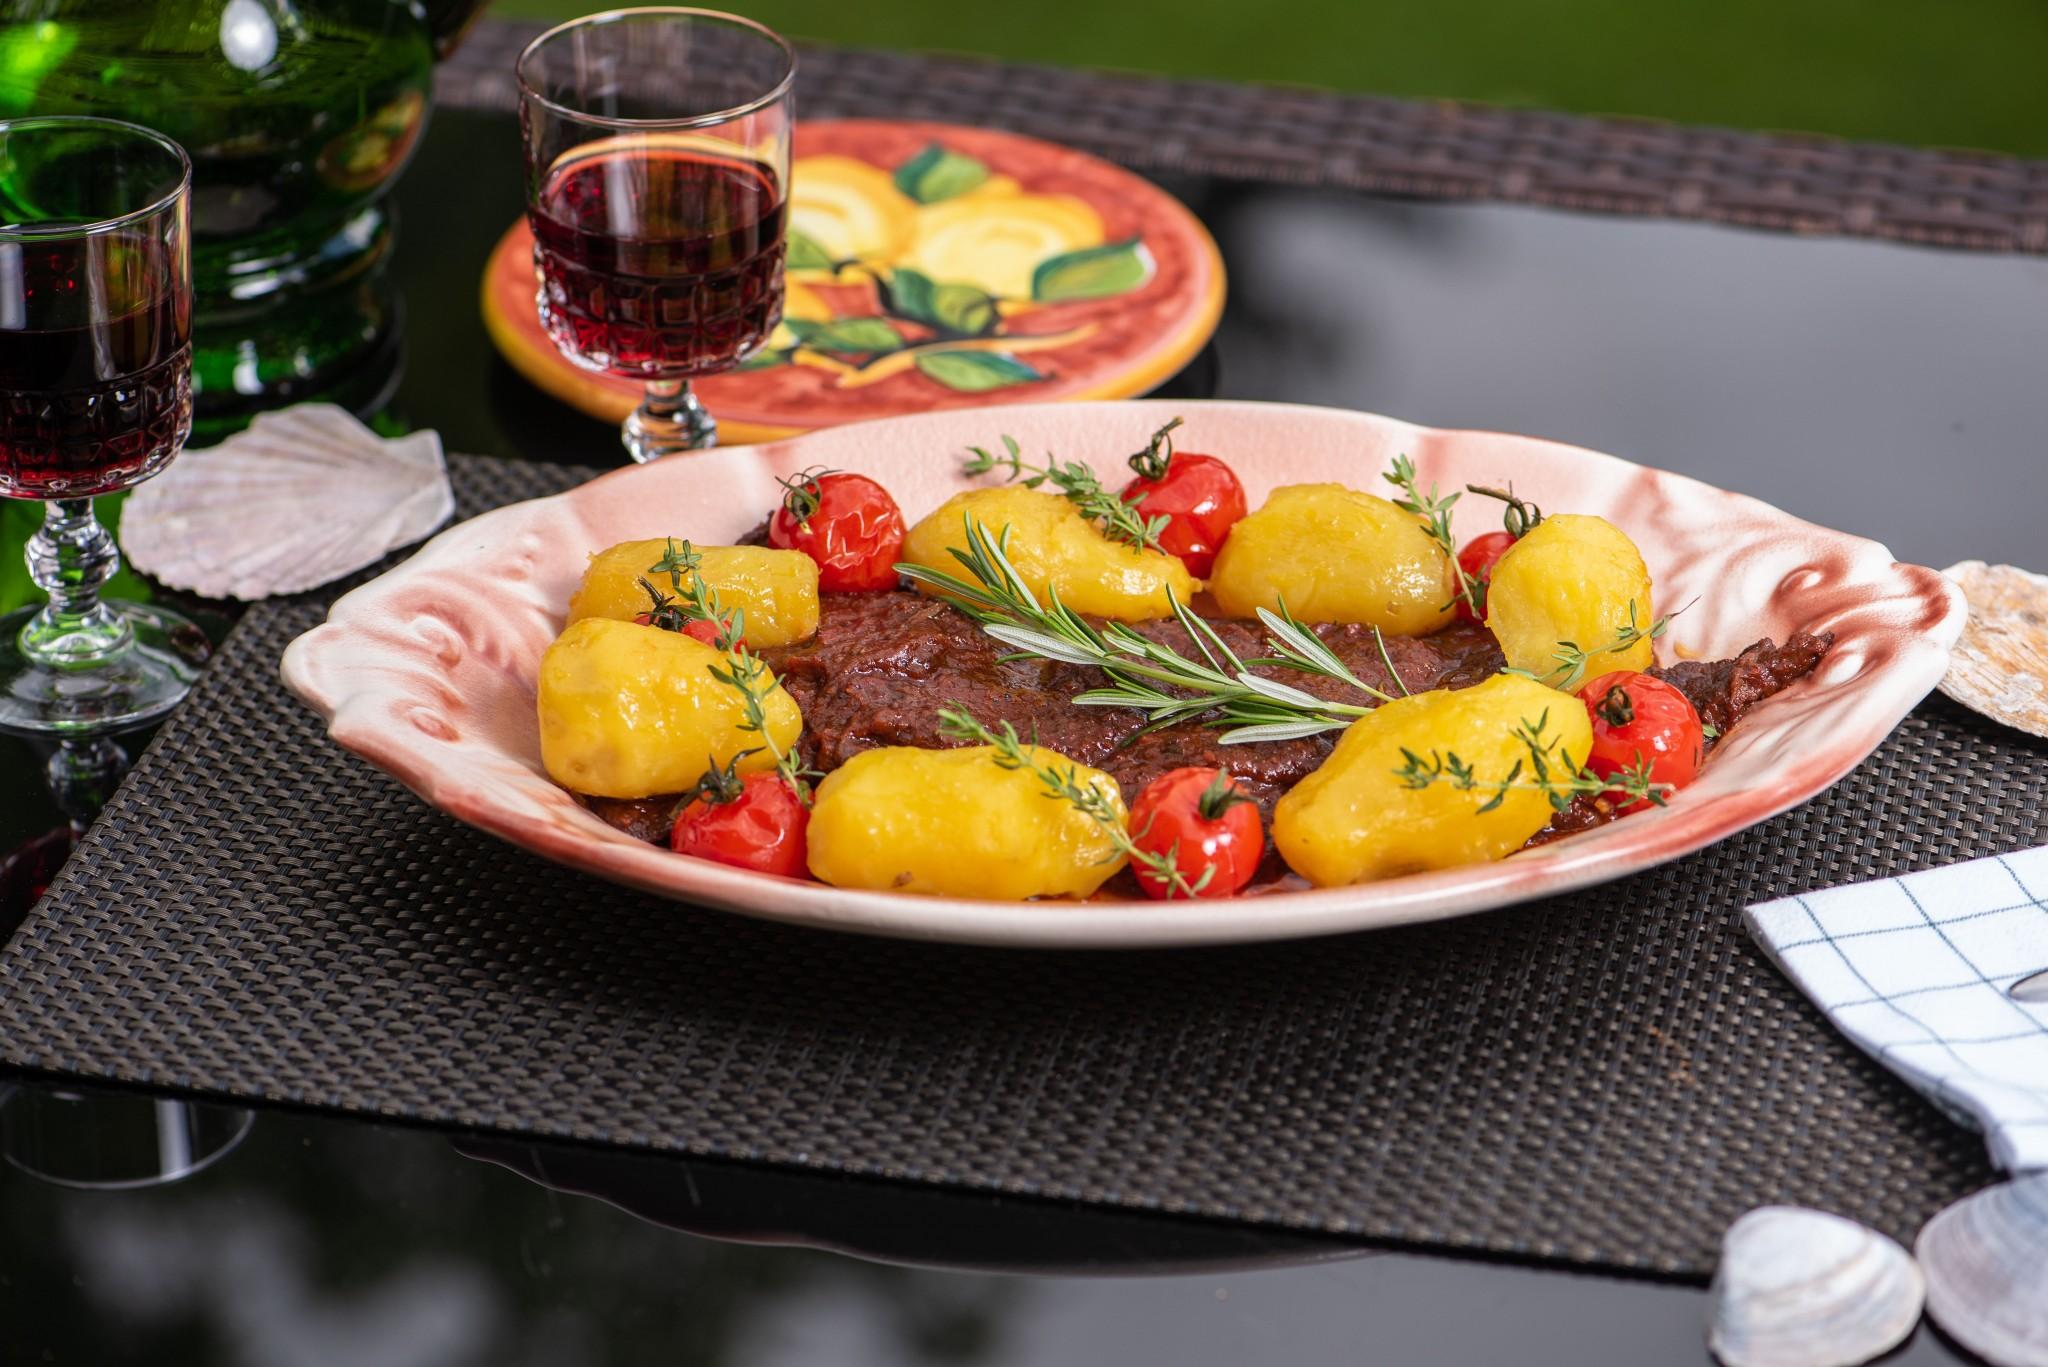 Rindfleisch provencial